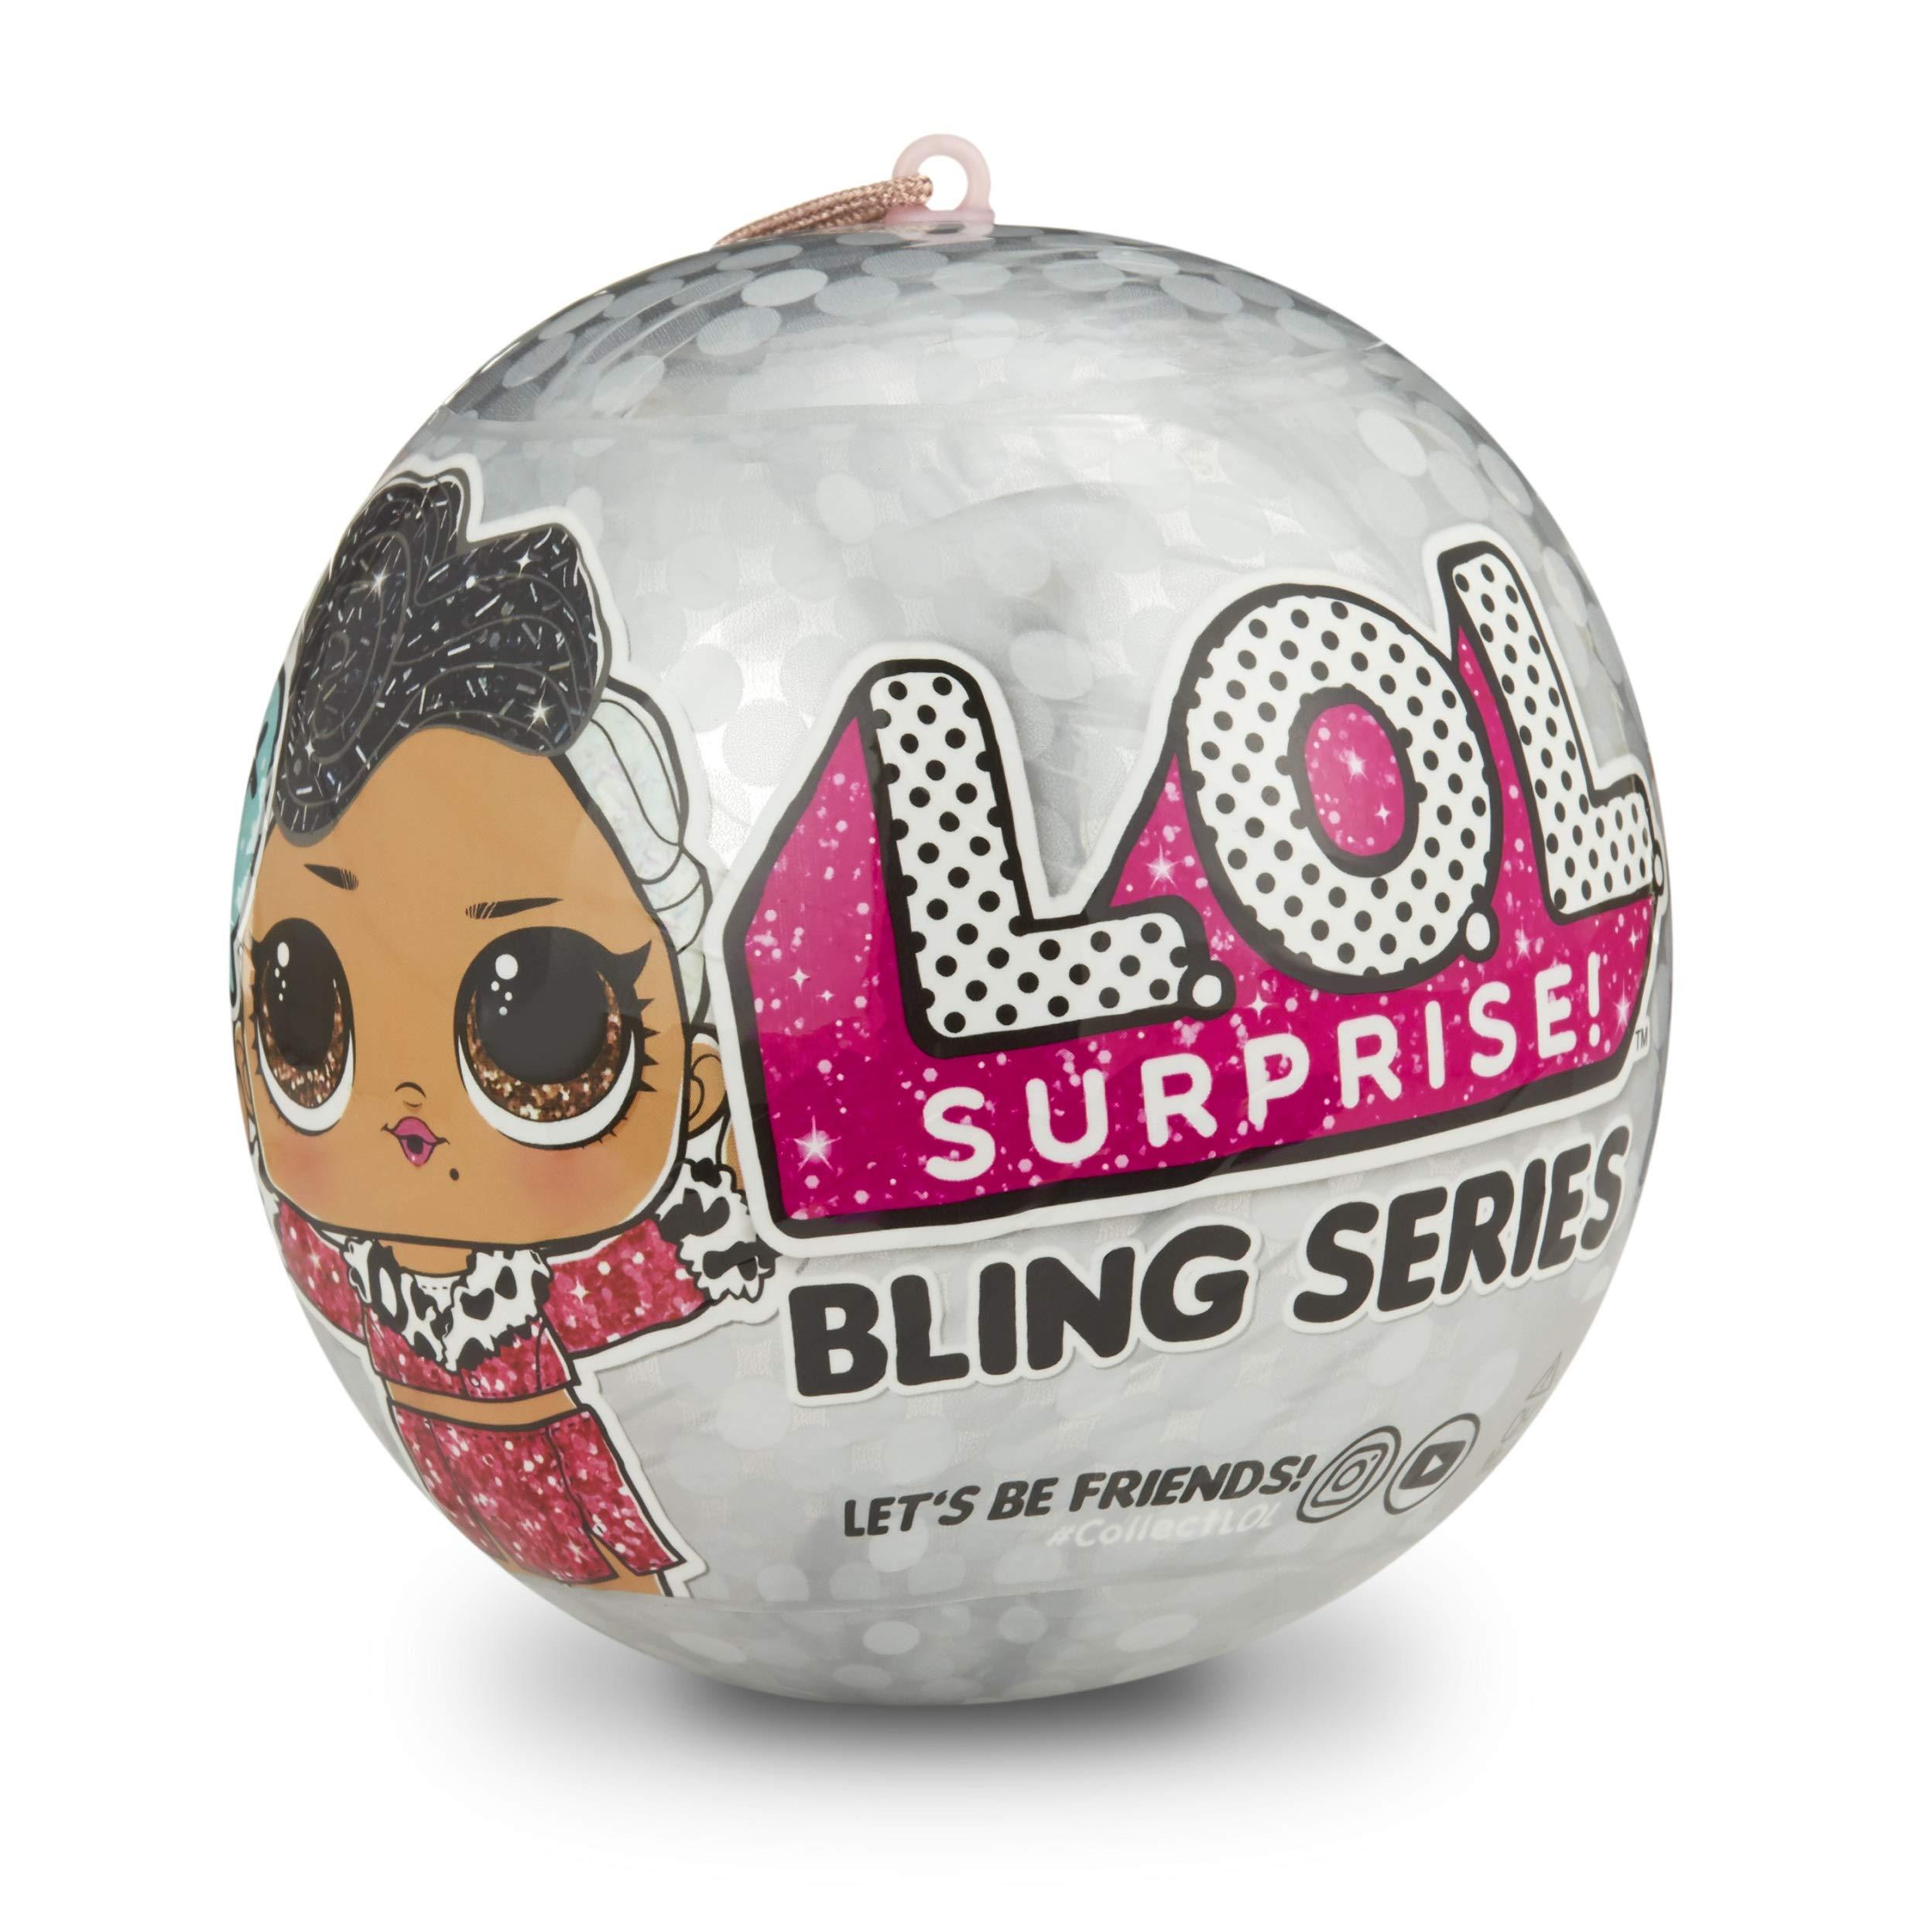 LOL 서프라이즈 블링 시리즈 인형 LOL Surprise! Bling Series with 7 Surprises